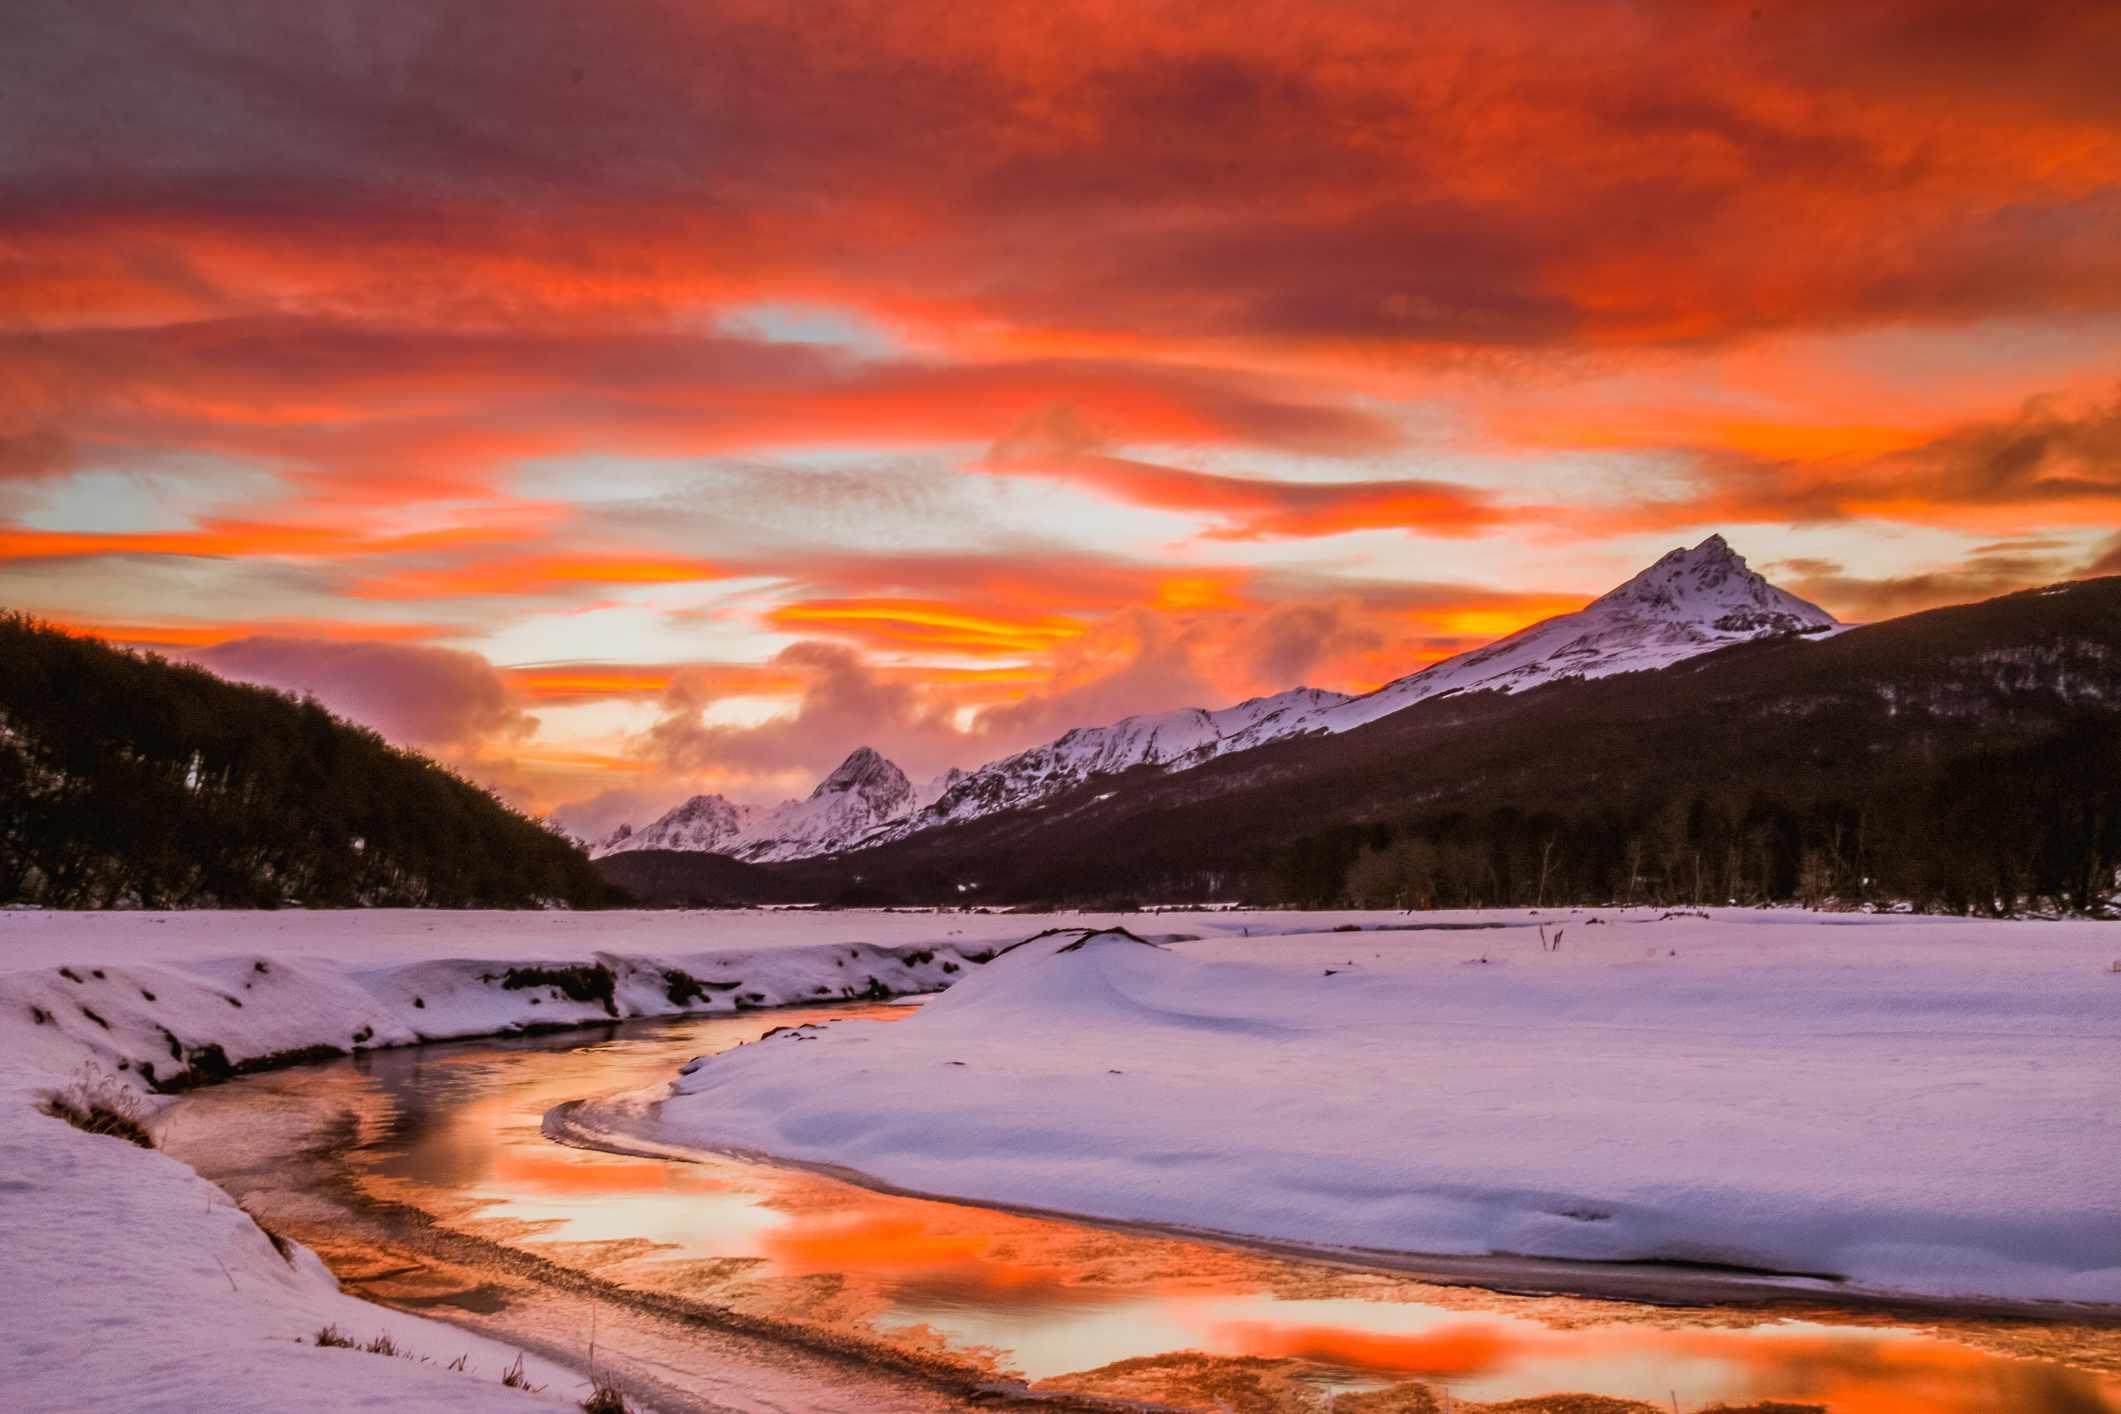 Tierra del Fuego at Sunset